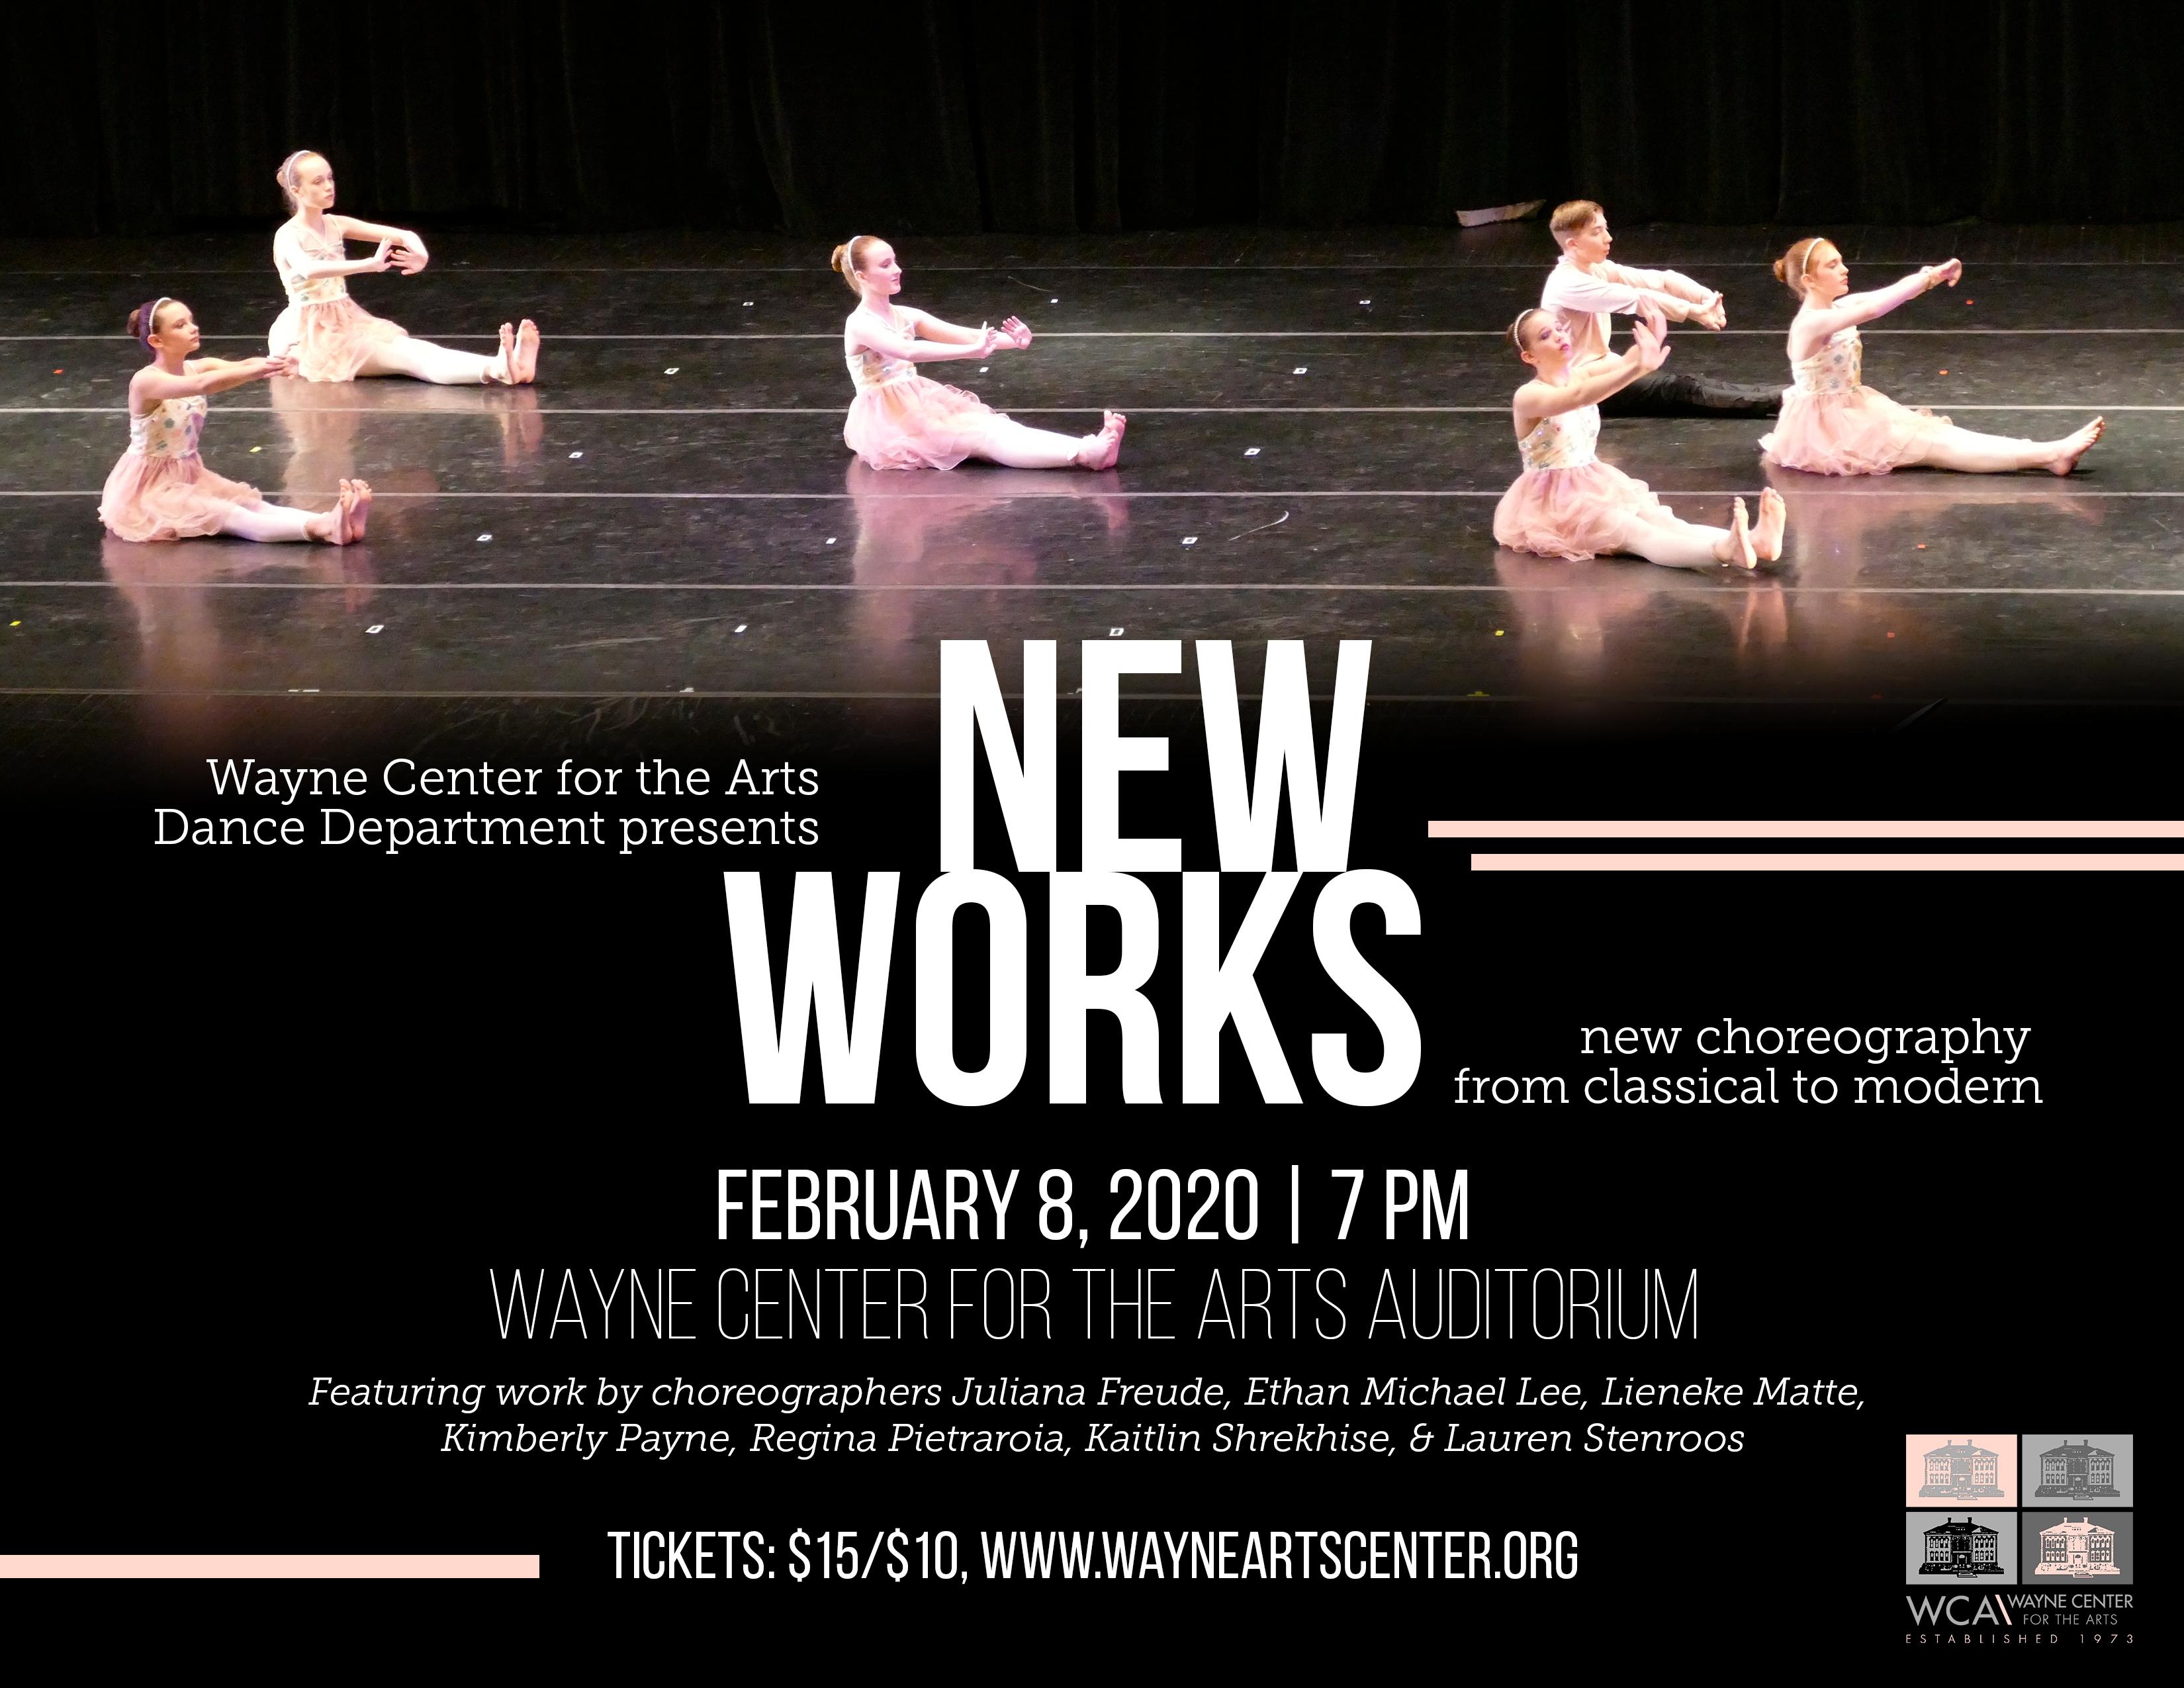 WCA Dance Department presents: New Works